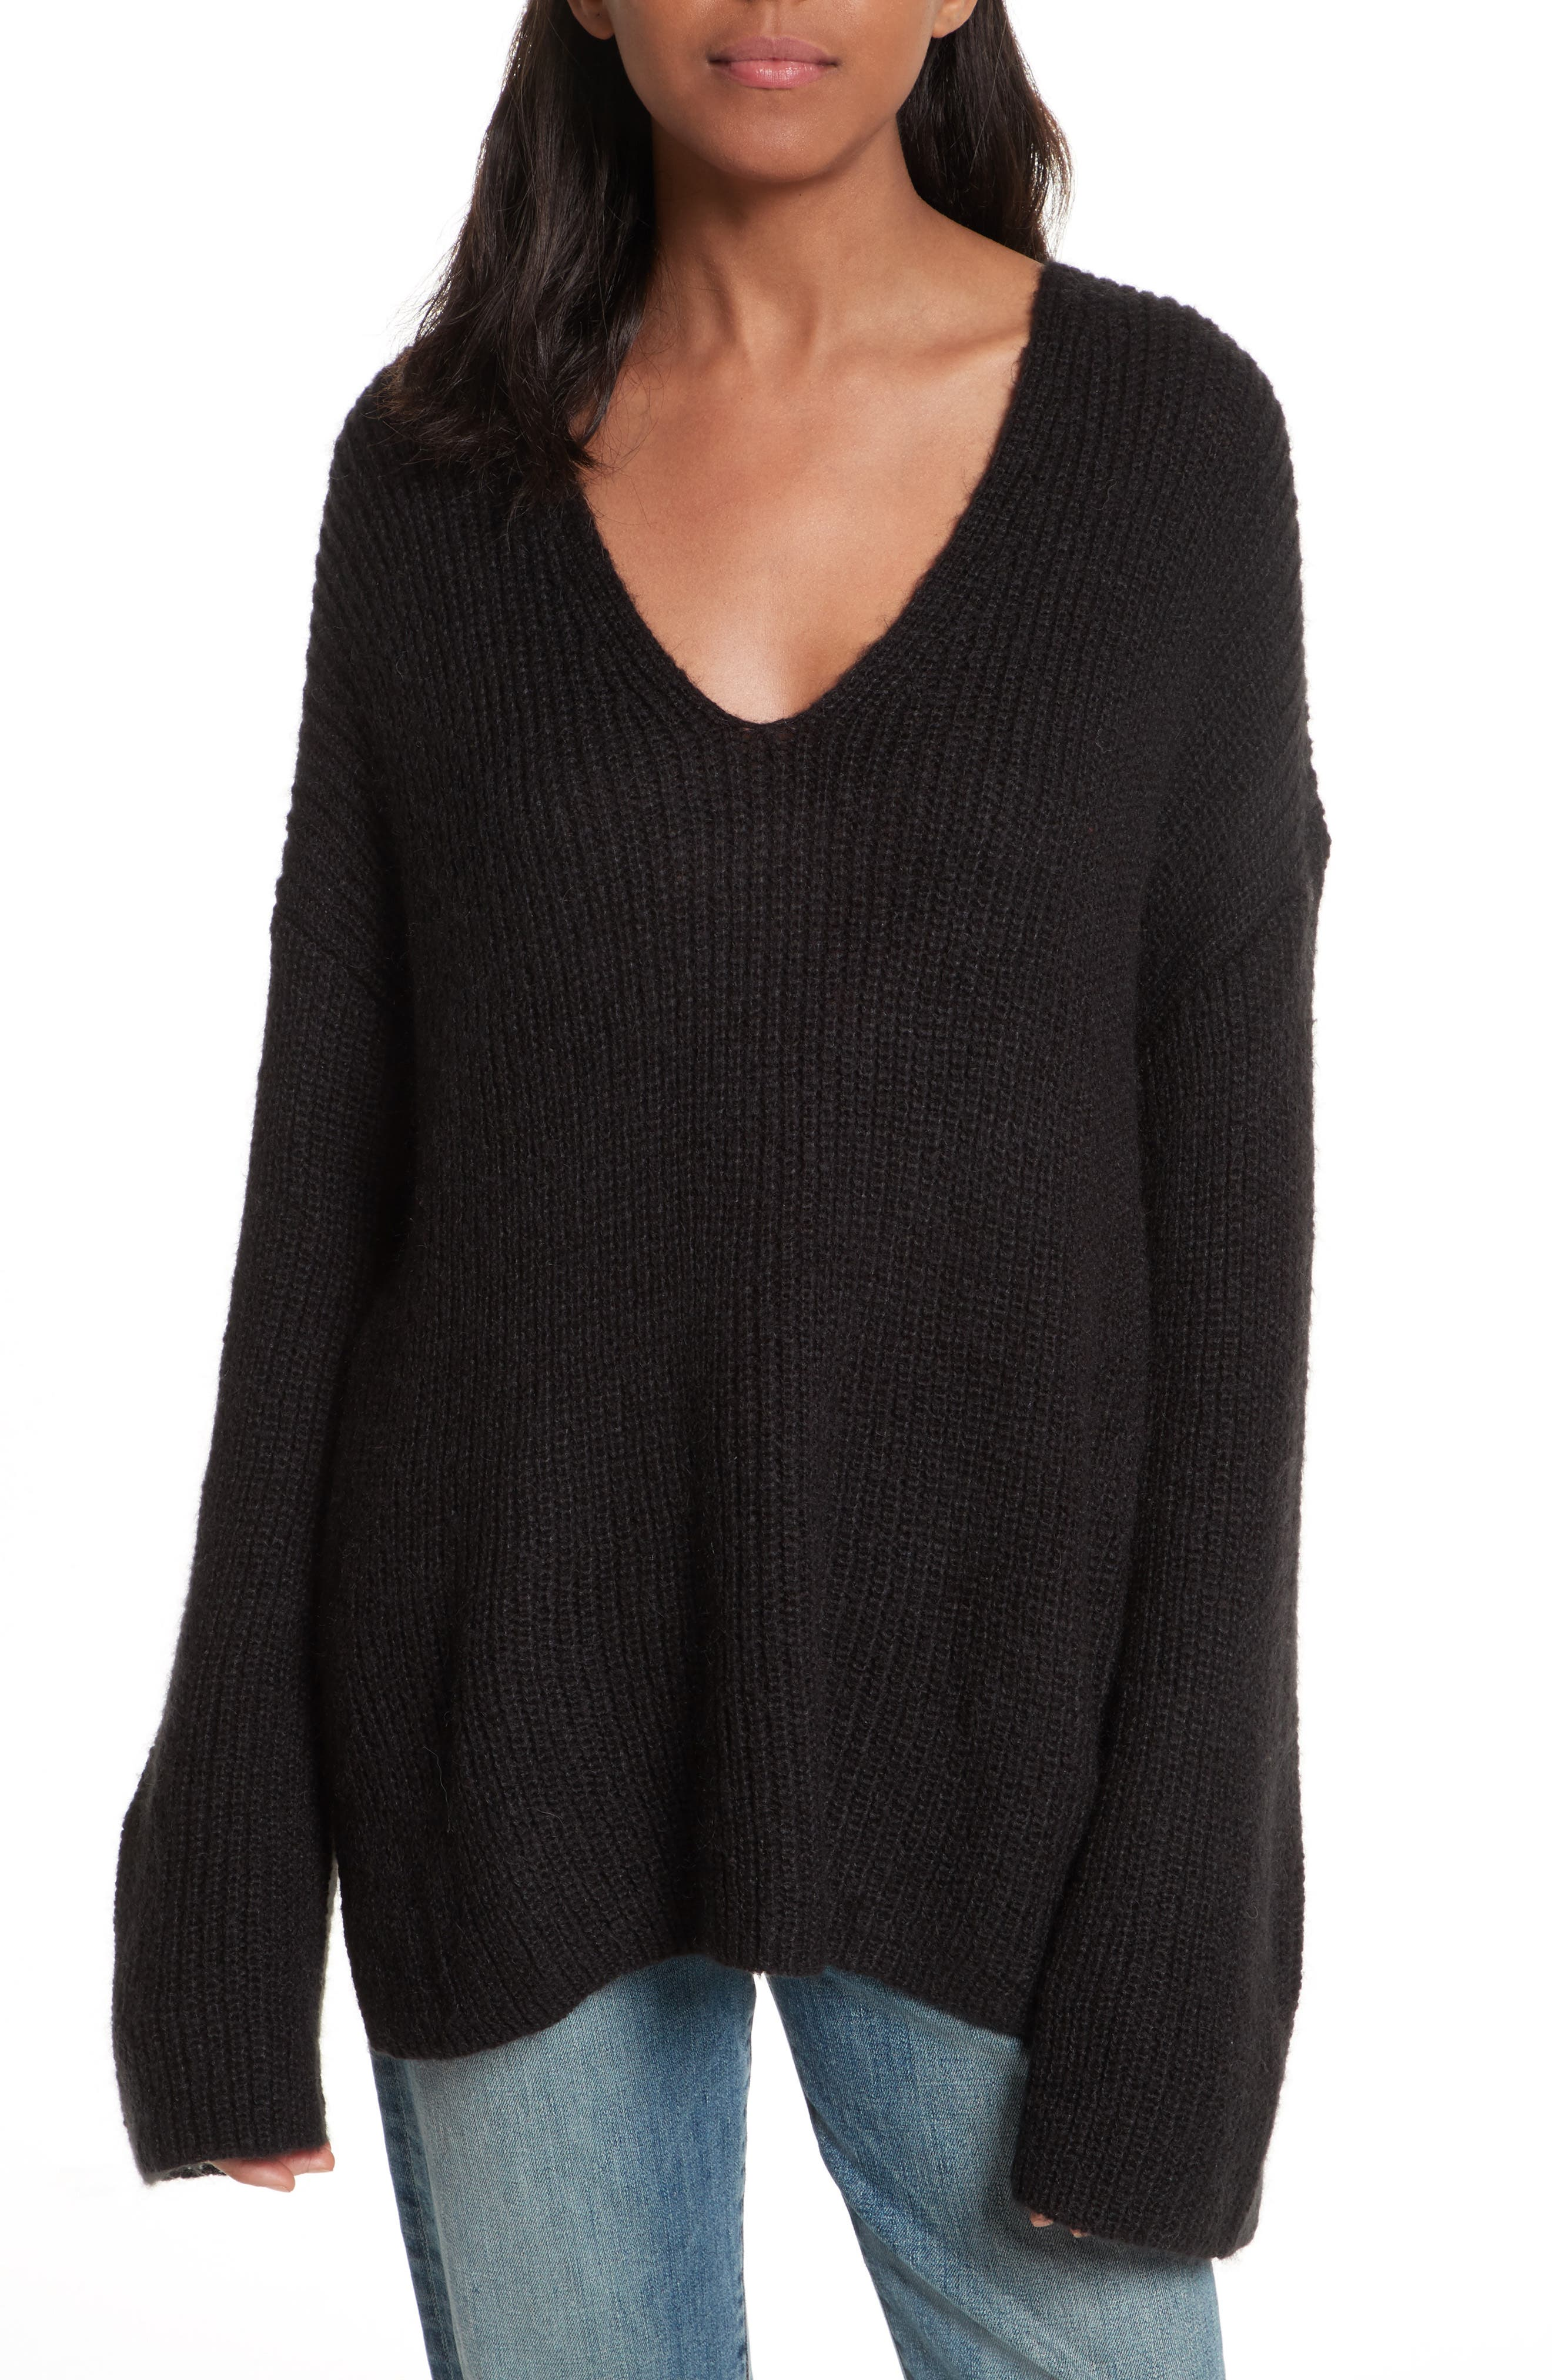 Remi Oversize Sweater,                             Main thumbnail 1, color,                             001